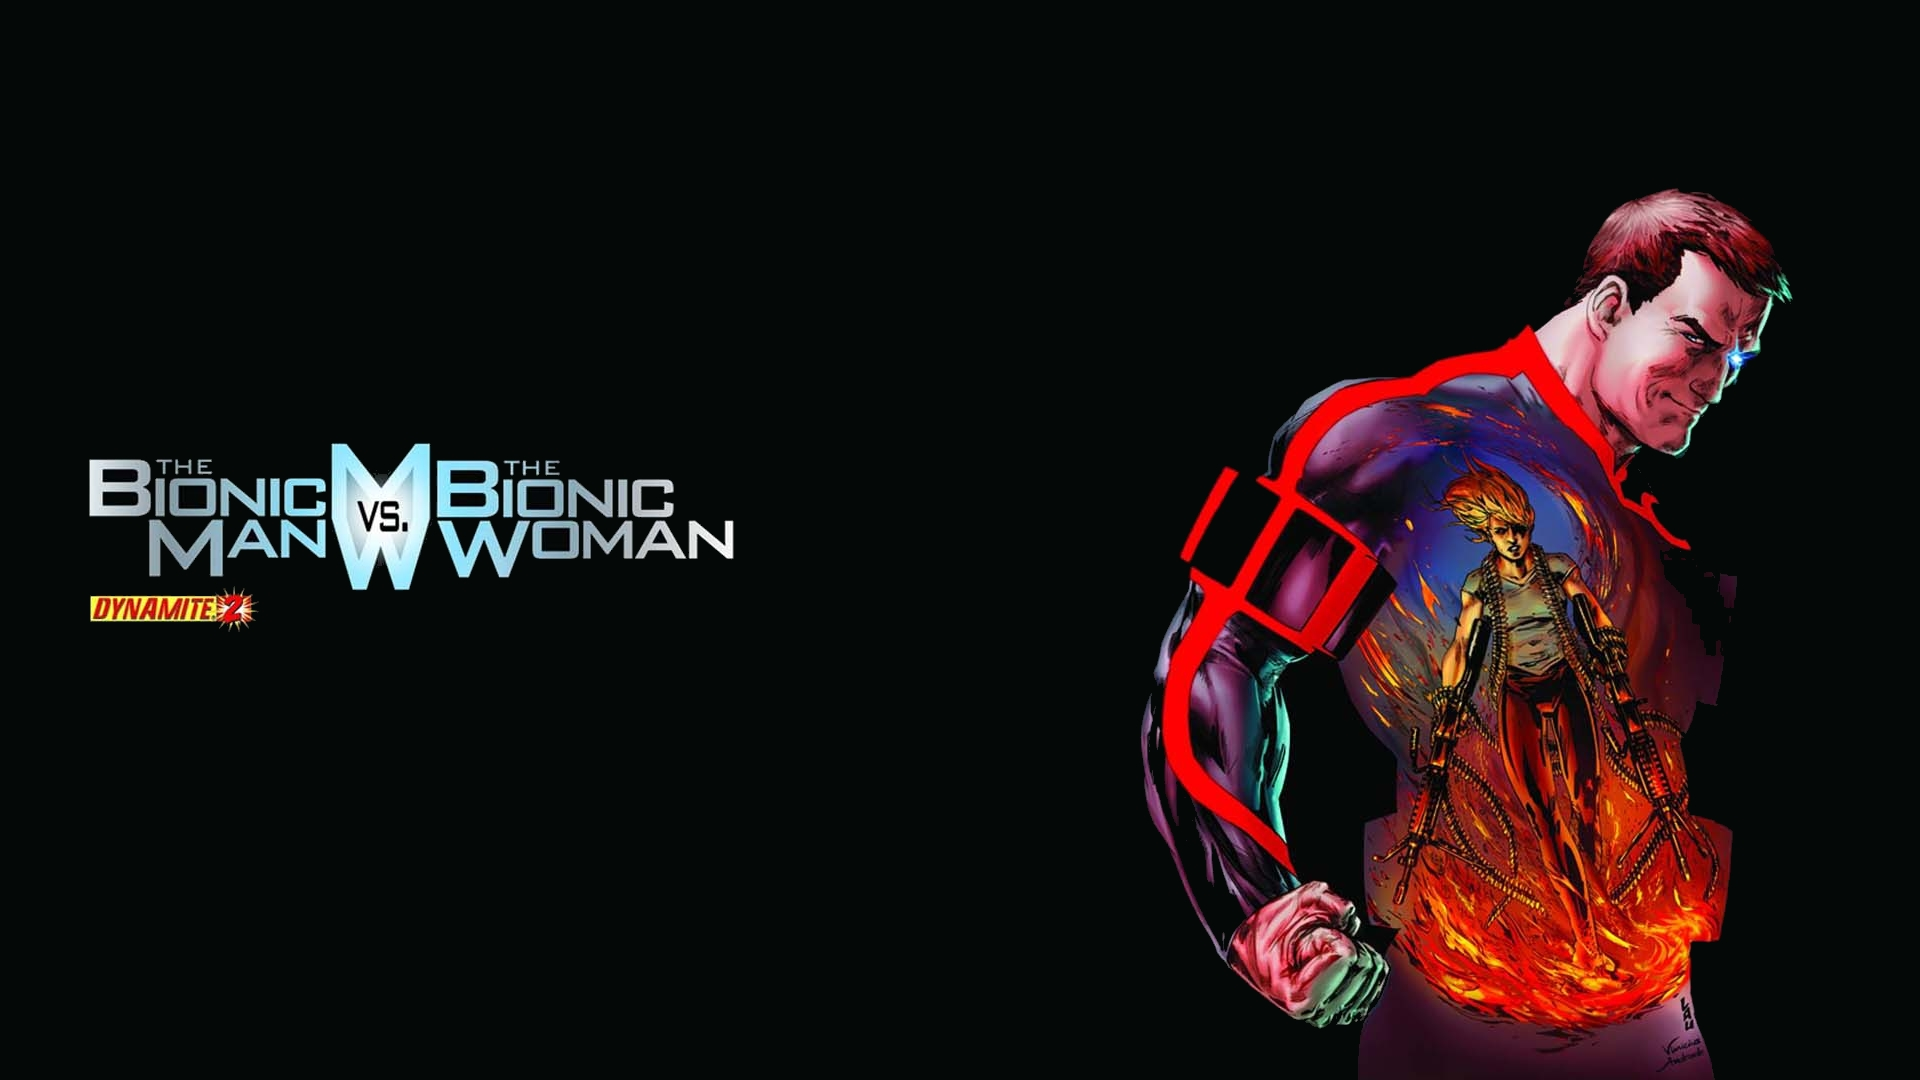 The Bionic Man Vs The Bionic Woman Full HD Wallpaper and ...